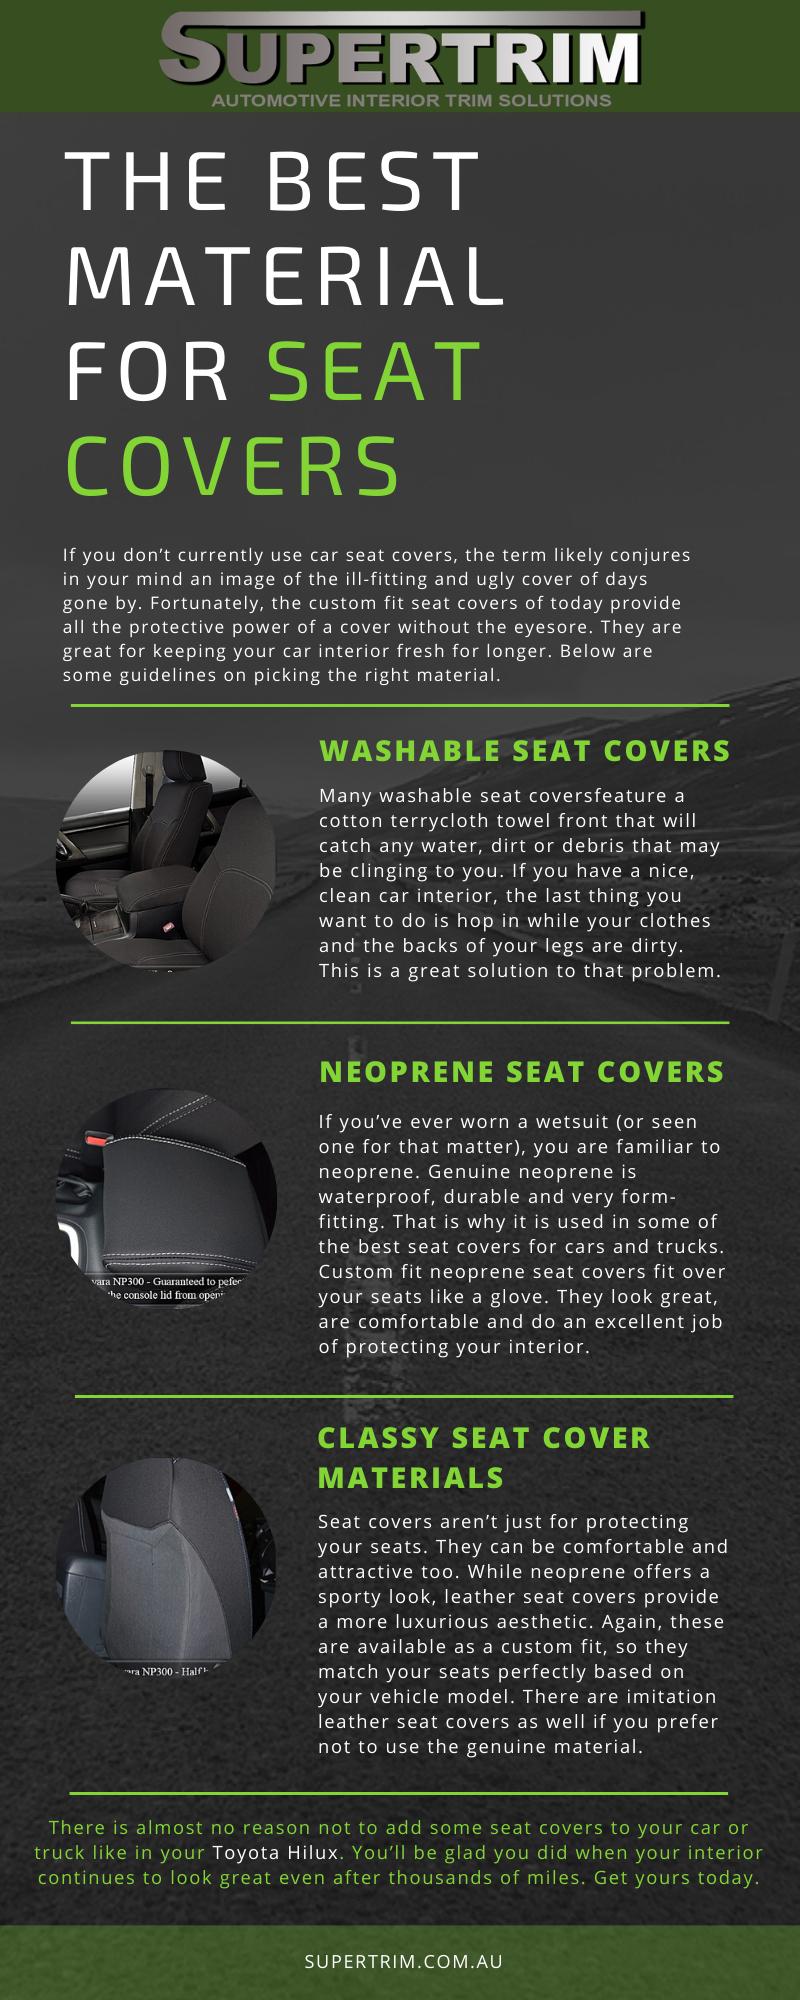 Custom Neoprene Car Seat Covers For Toyota Hilux Custom Car Seat Covers Carseat Cover Seat Covers